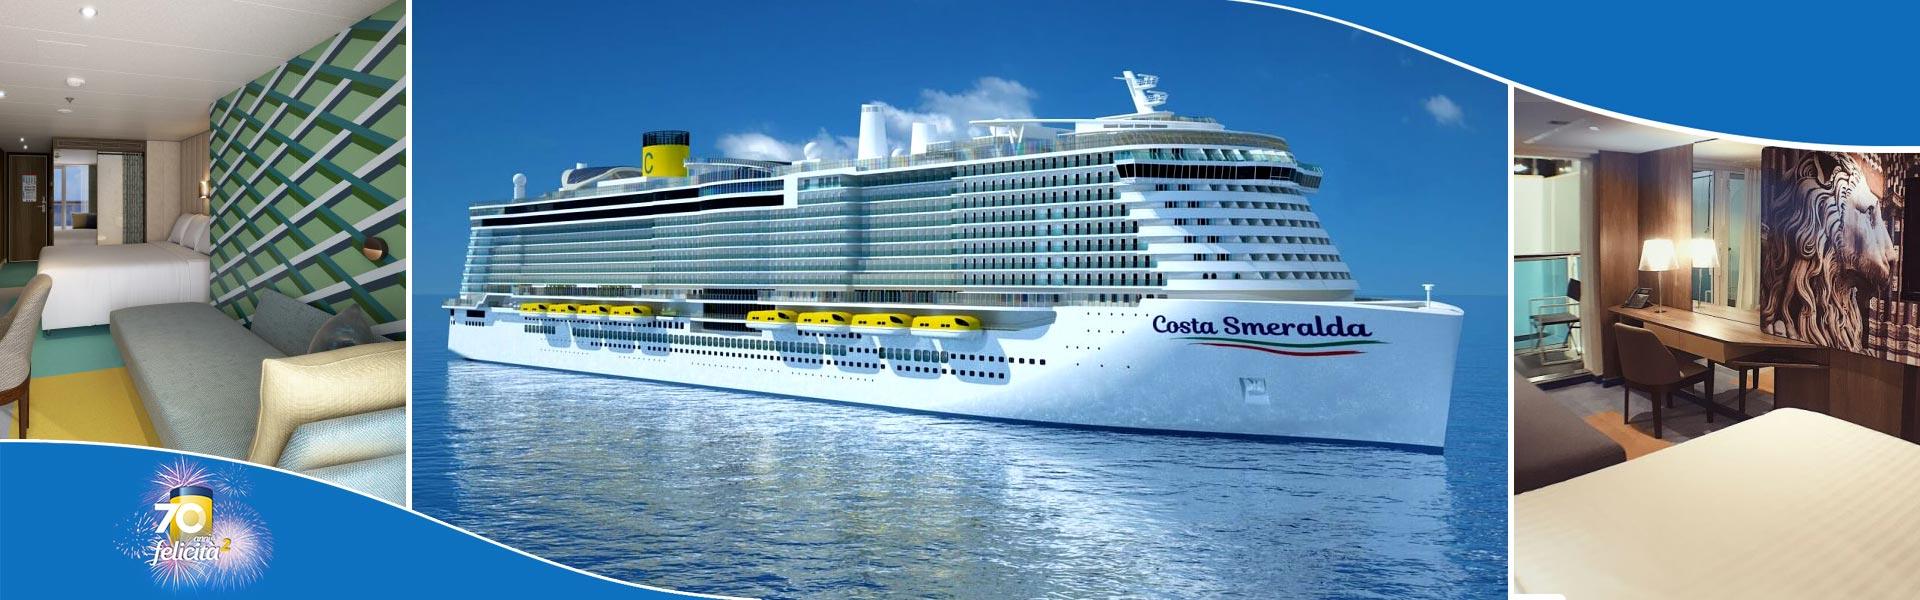 Costa Smeralda, la nuova nave Costa Crociere 2019